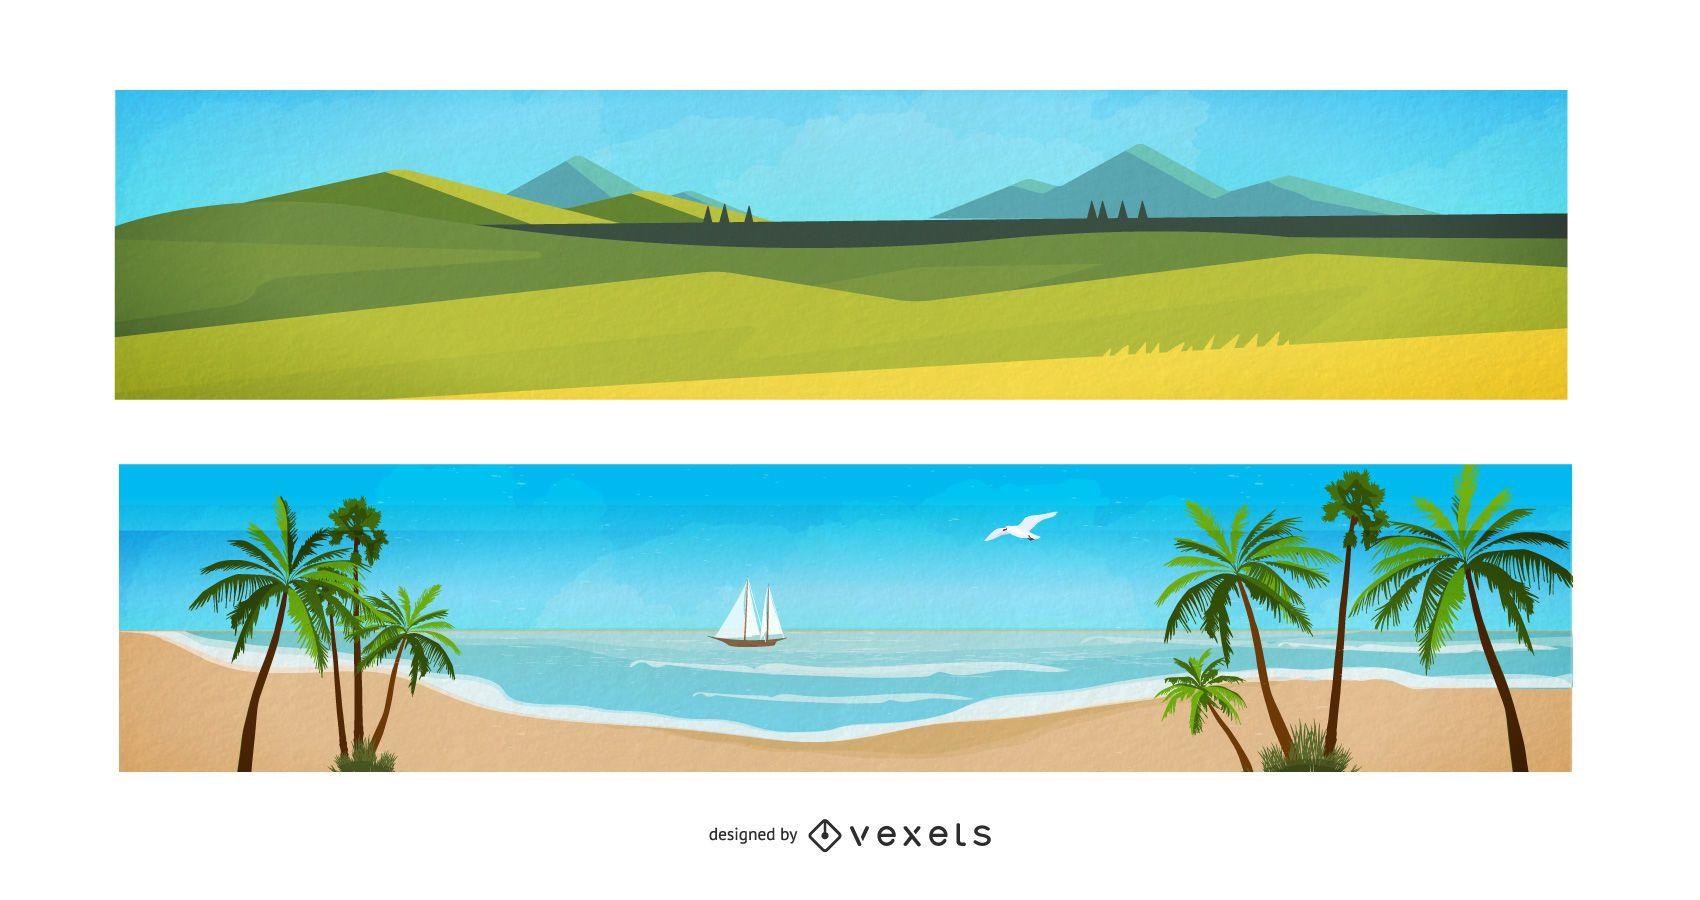 Watercolor Landscape Cartoon Banners